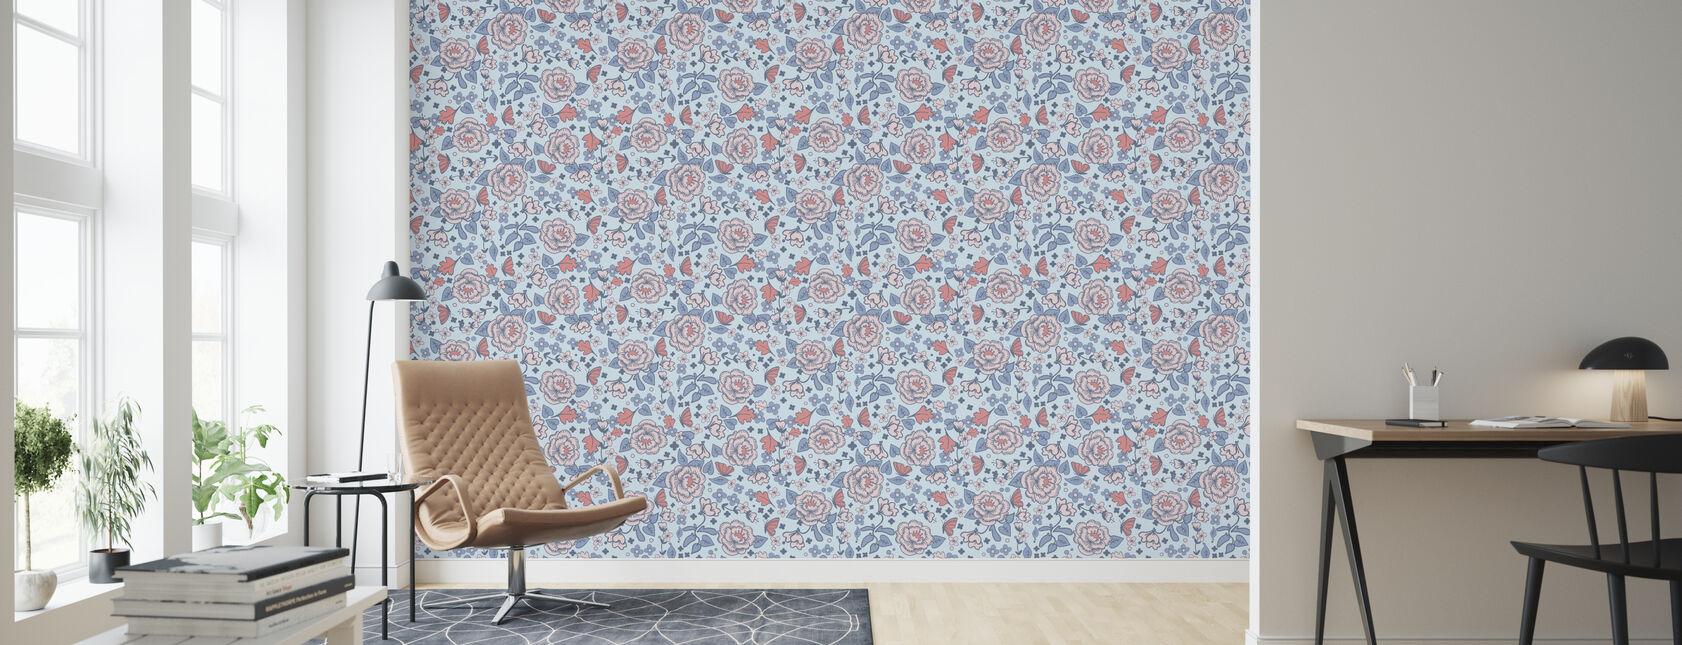 Walnut Grove Blue - Wallpaper - Living Room